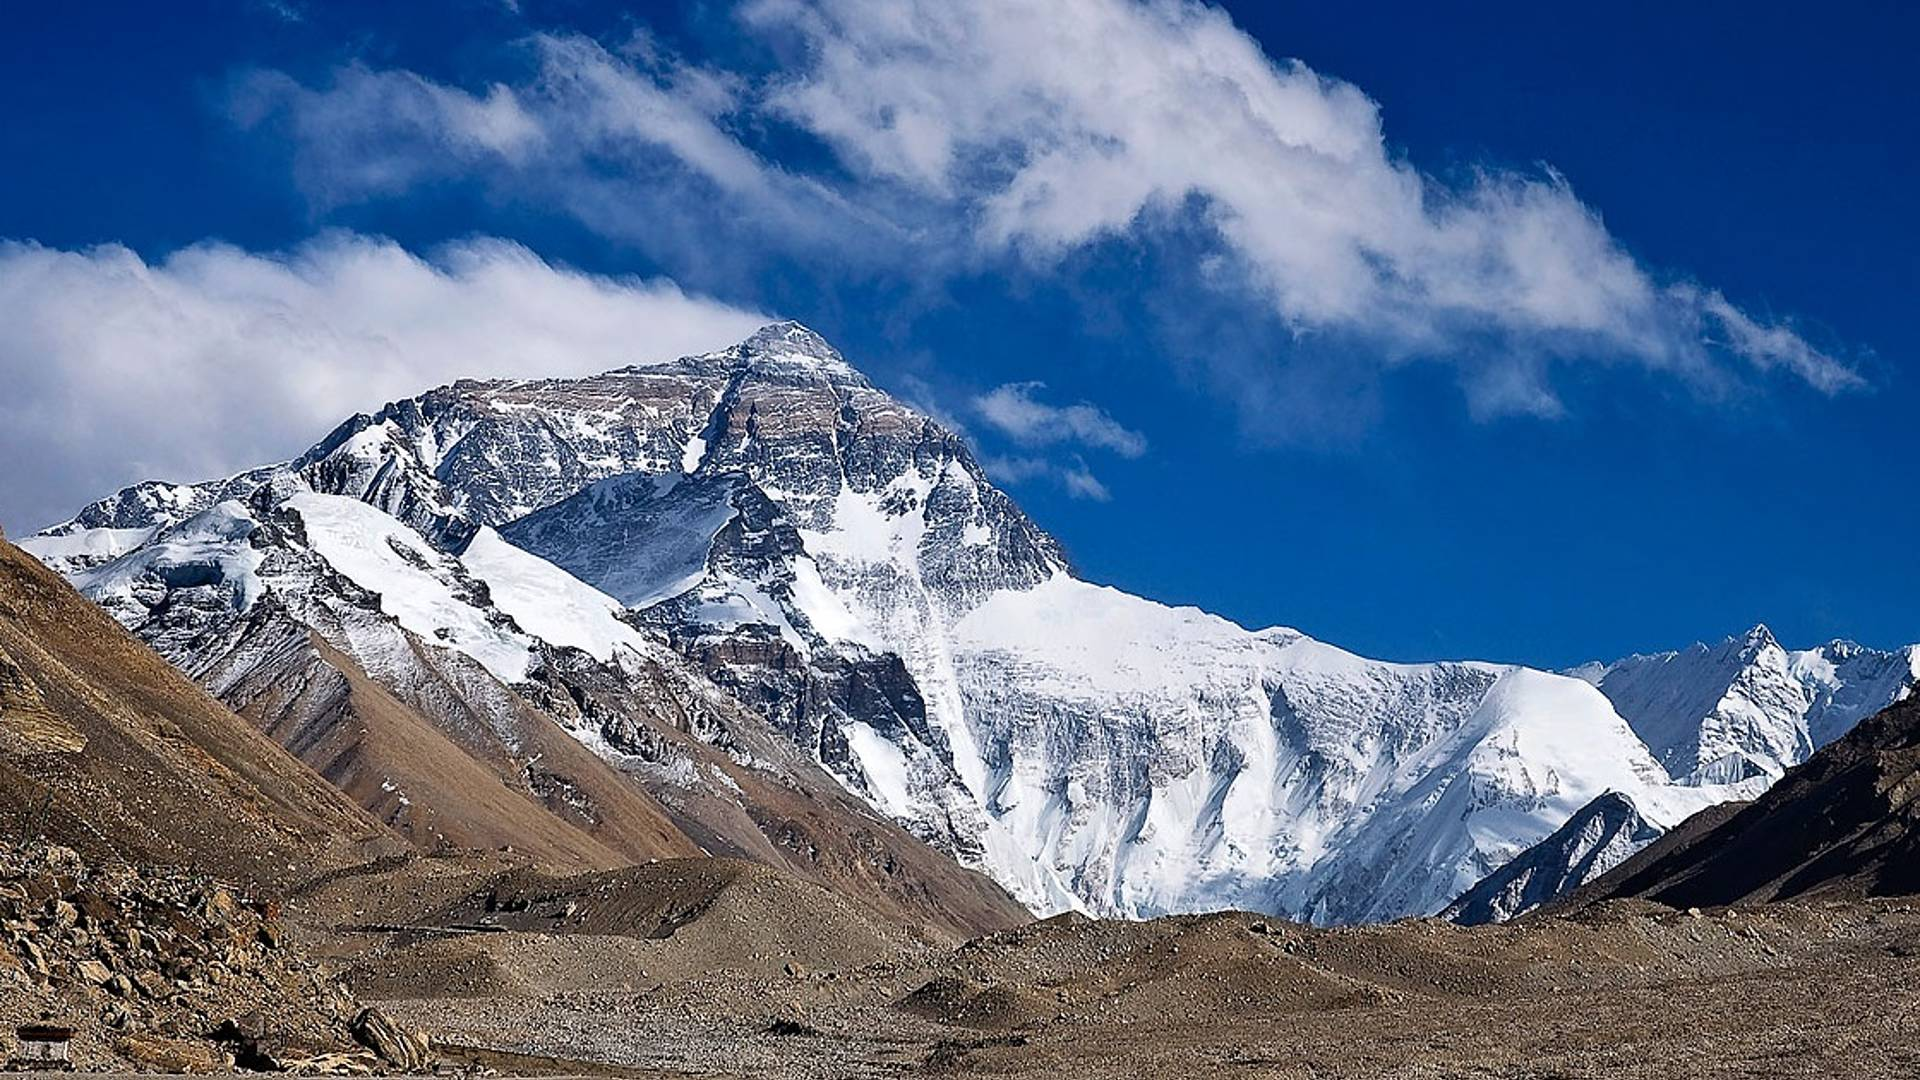 Vom Palast des Dalai Lamas zum Mount Everest